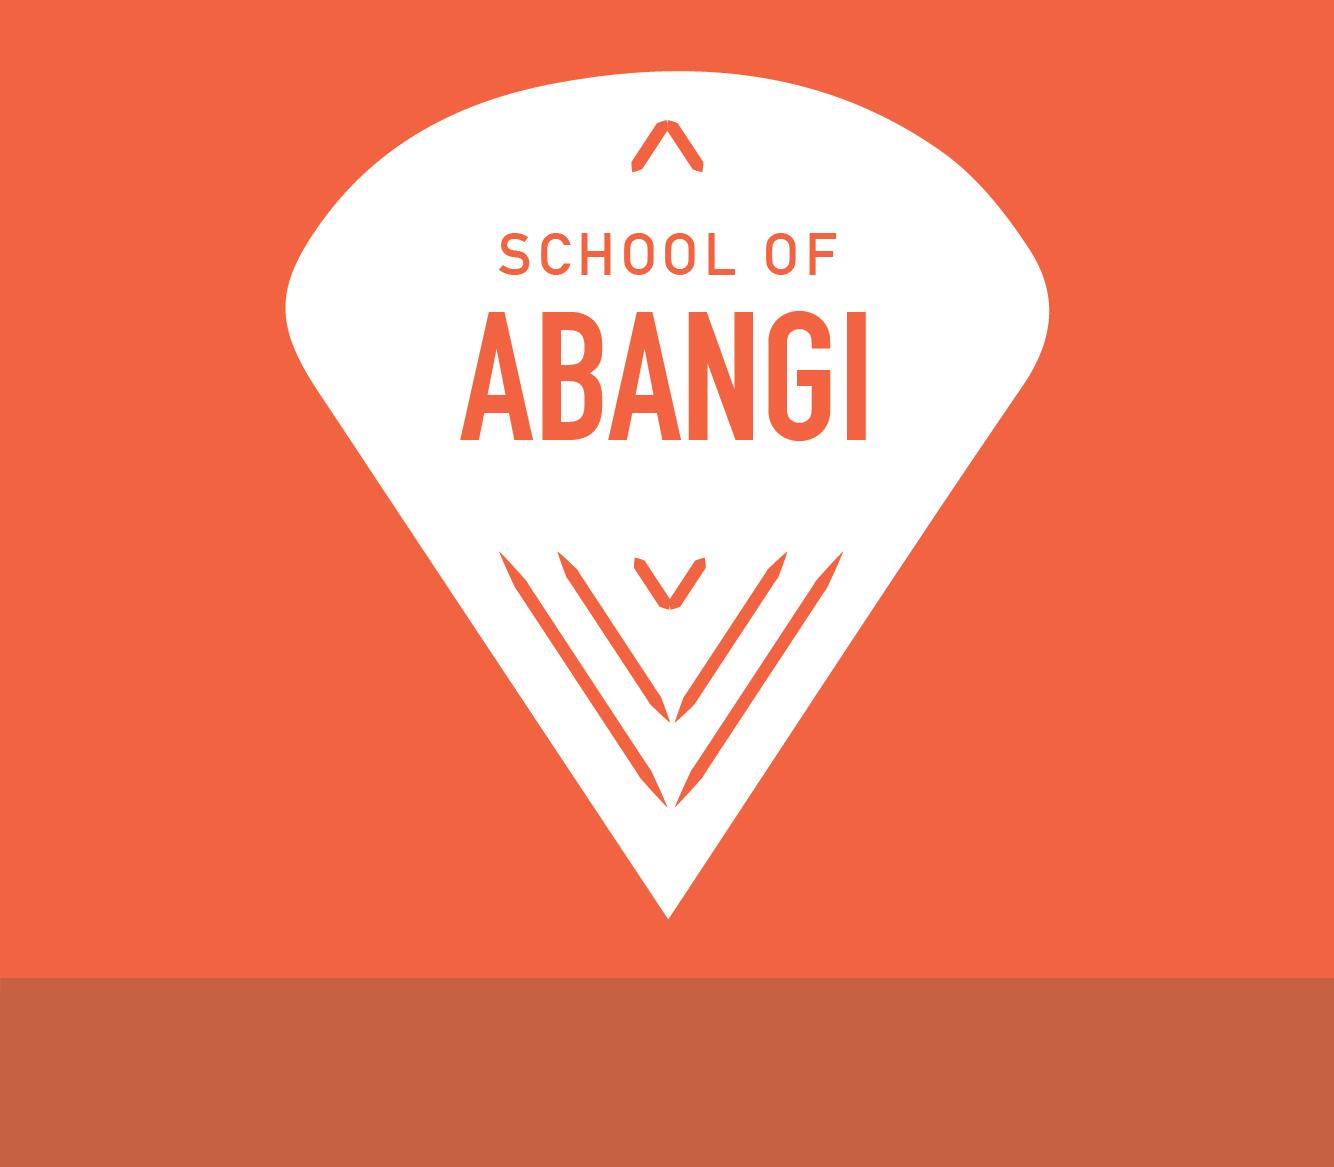 School of abangi